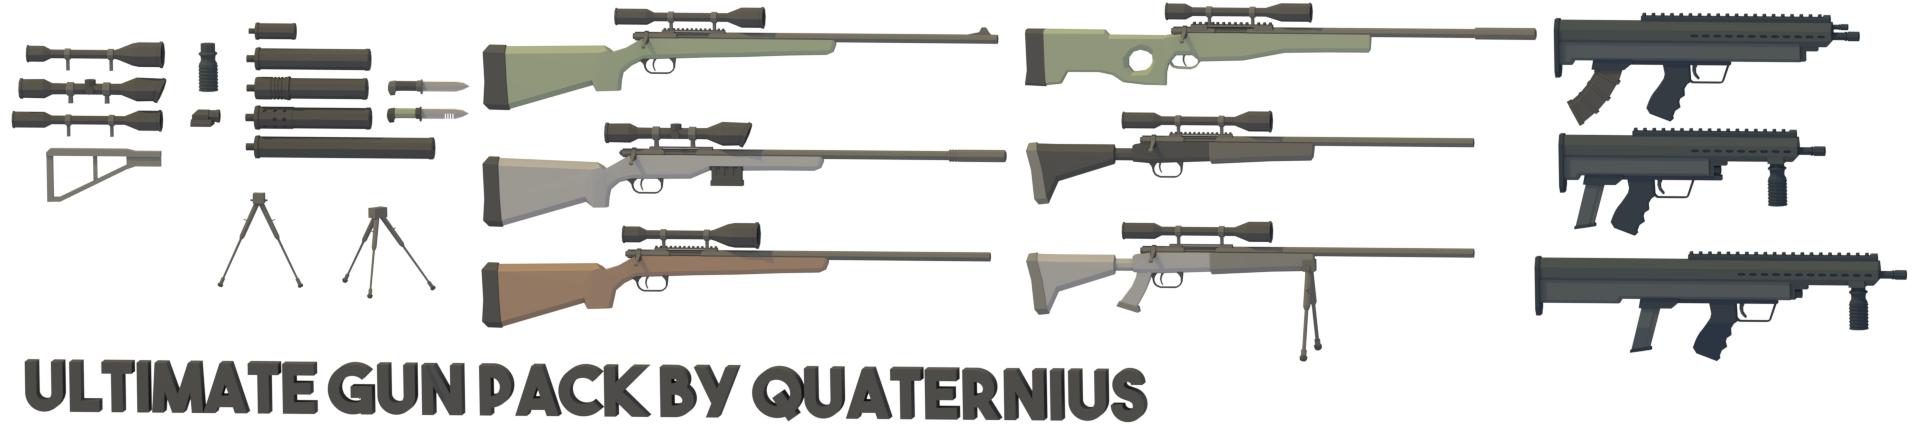 50+ LowPoly Guns